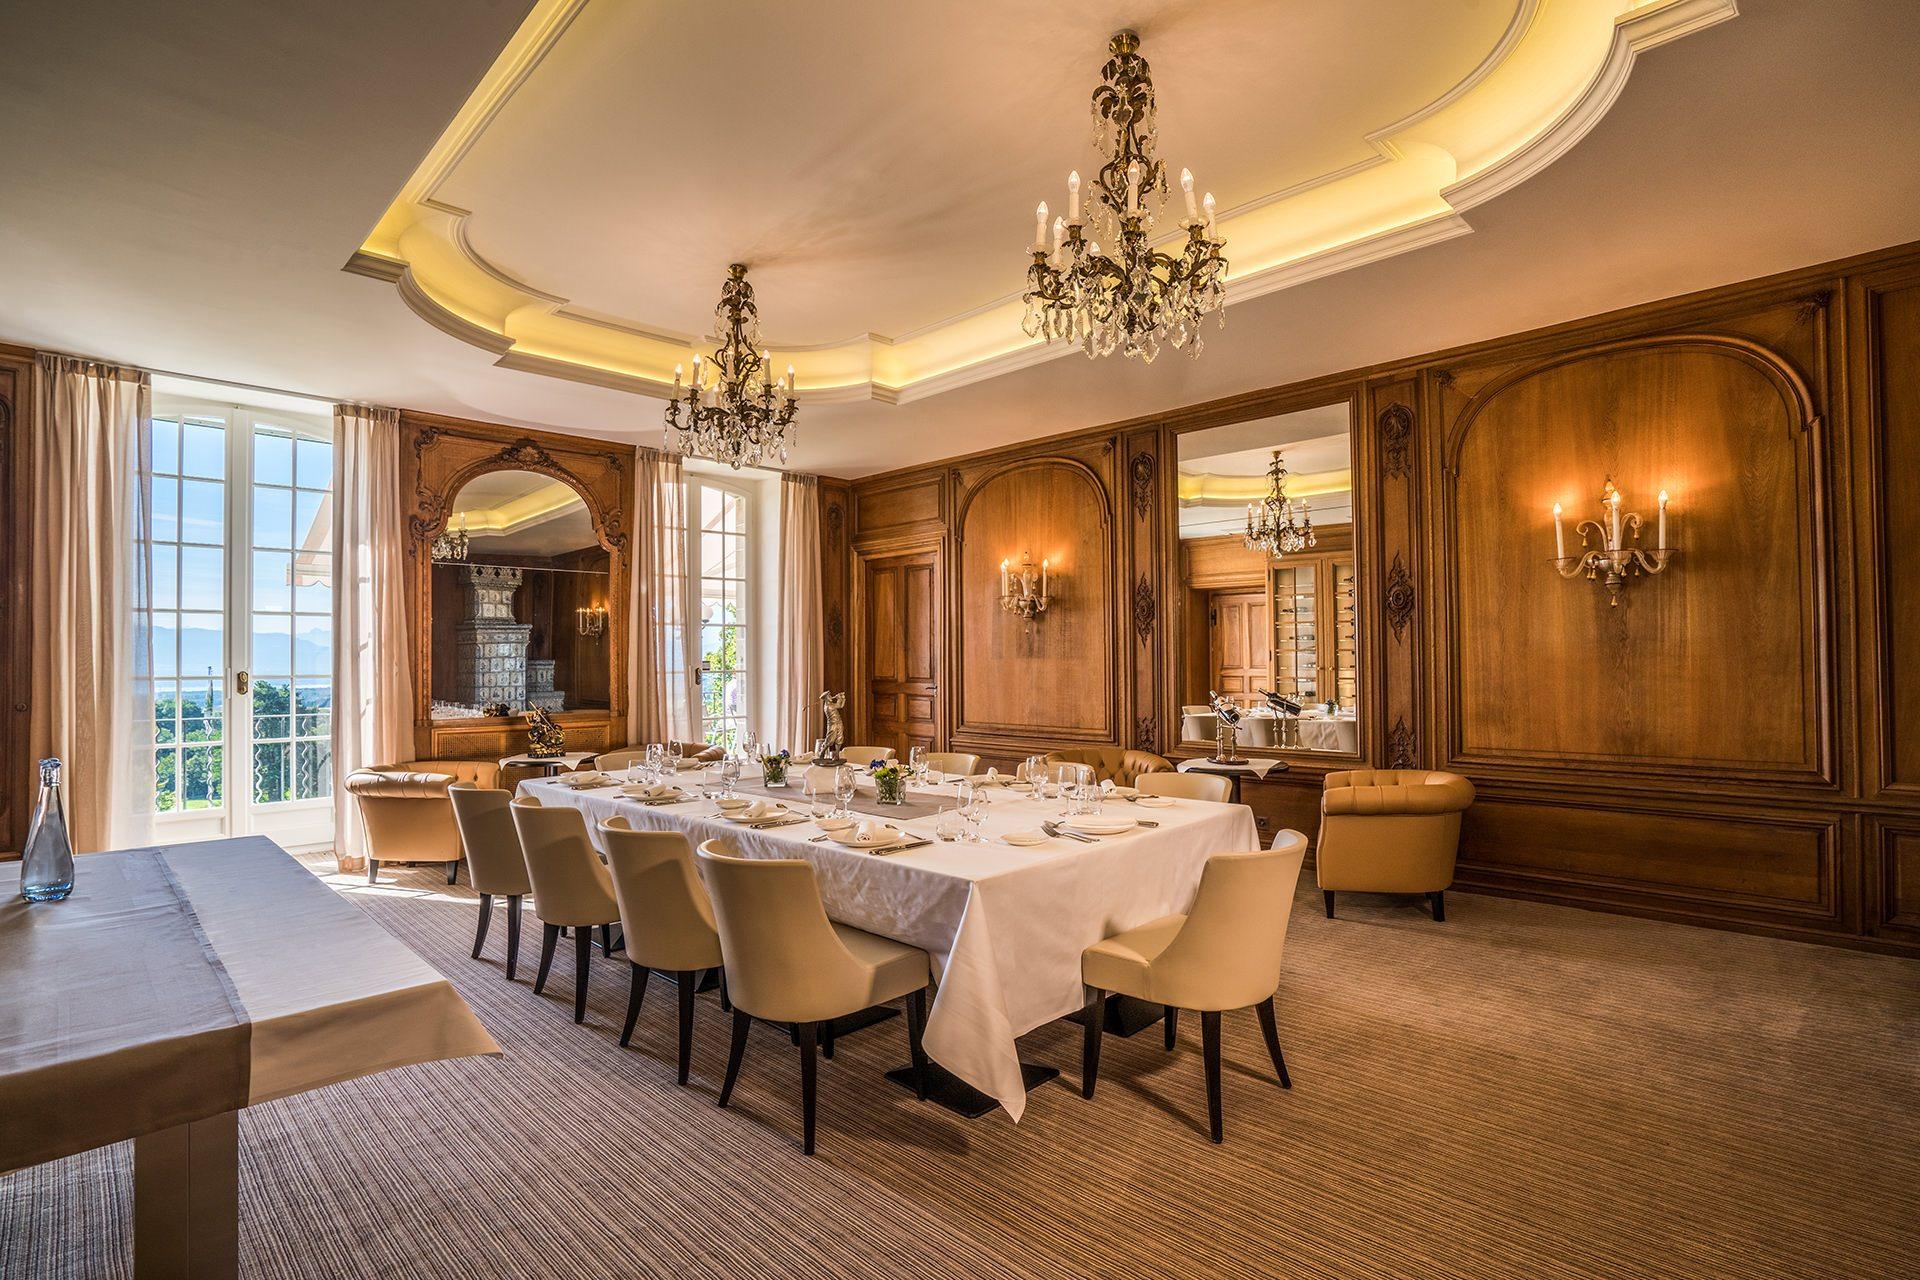 Restaurant golf country club de bonmont for Restaurant salle a manger tunis